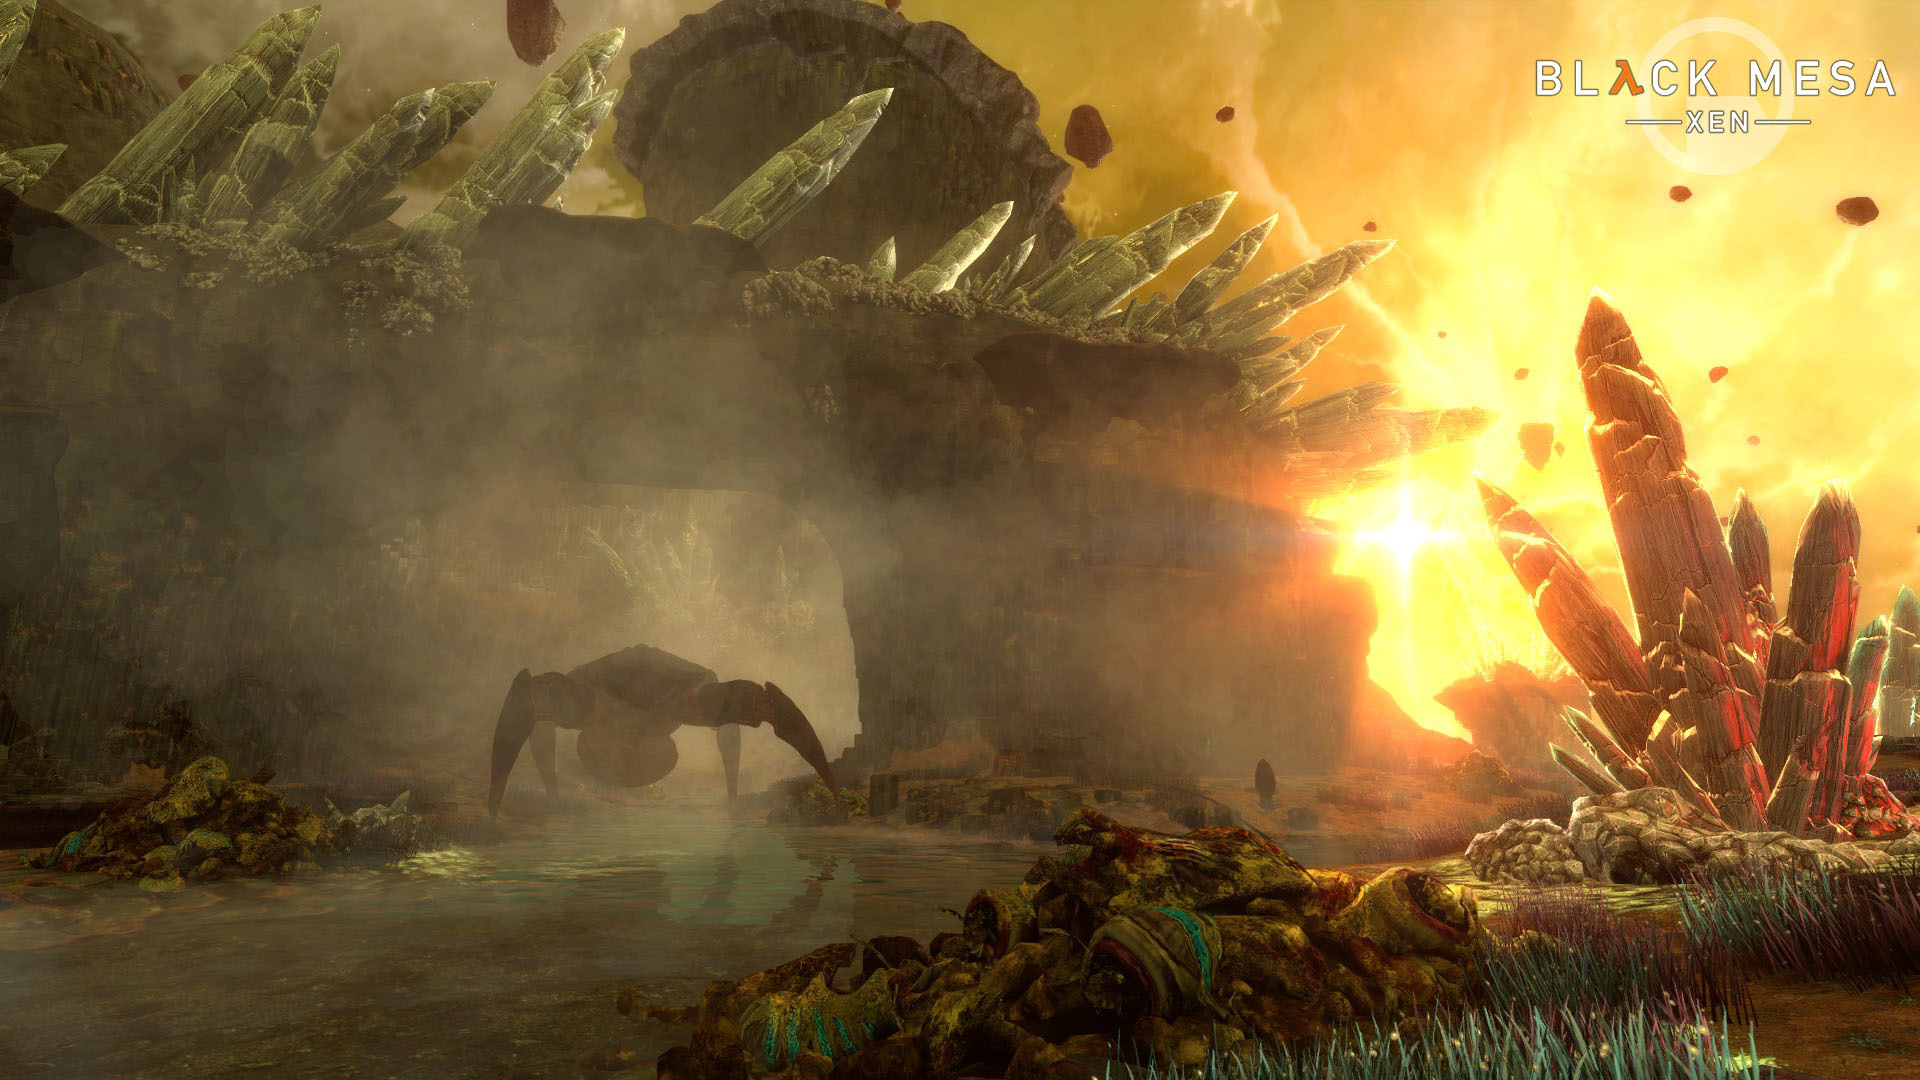 half-life video games video game art pc gaming black mesa